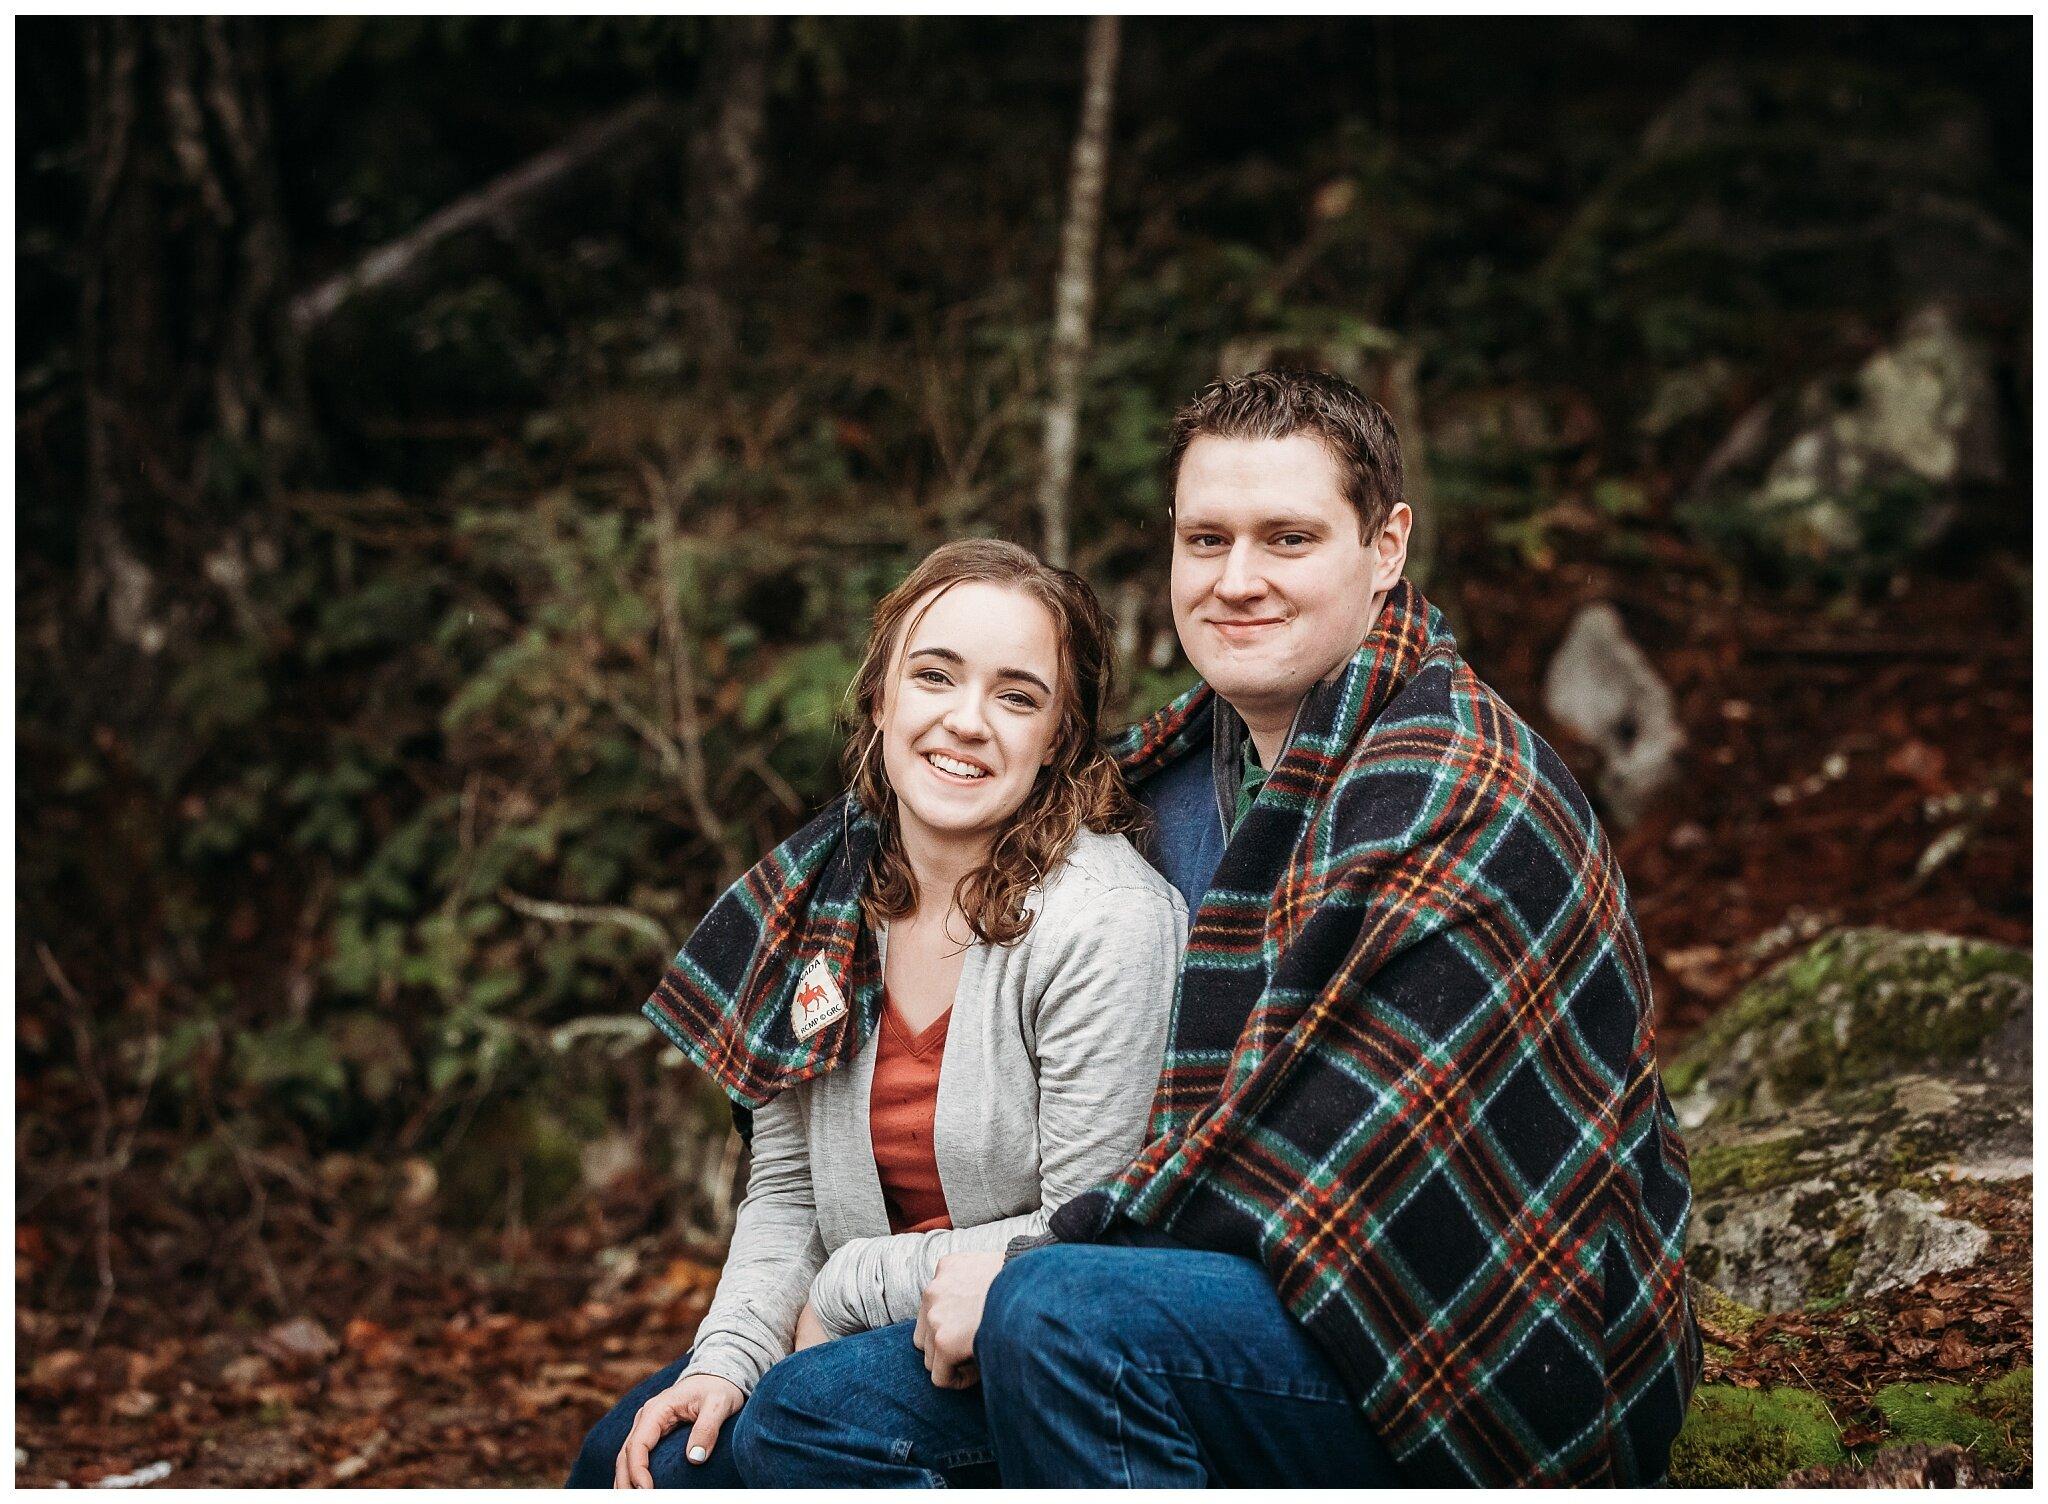 Chilliwack Lake Rainy Winter Engagement Photography Session Couples Photographer_0002.jpg